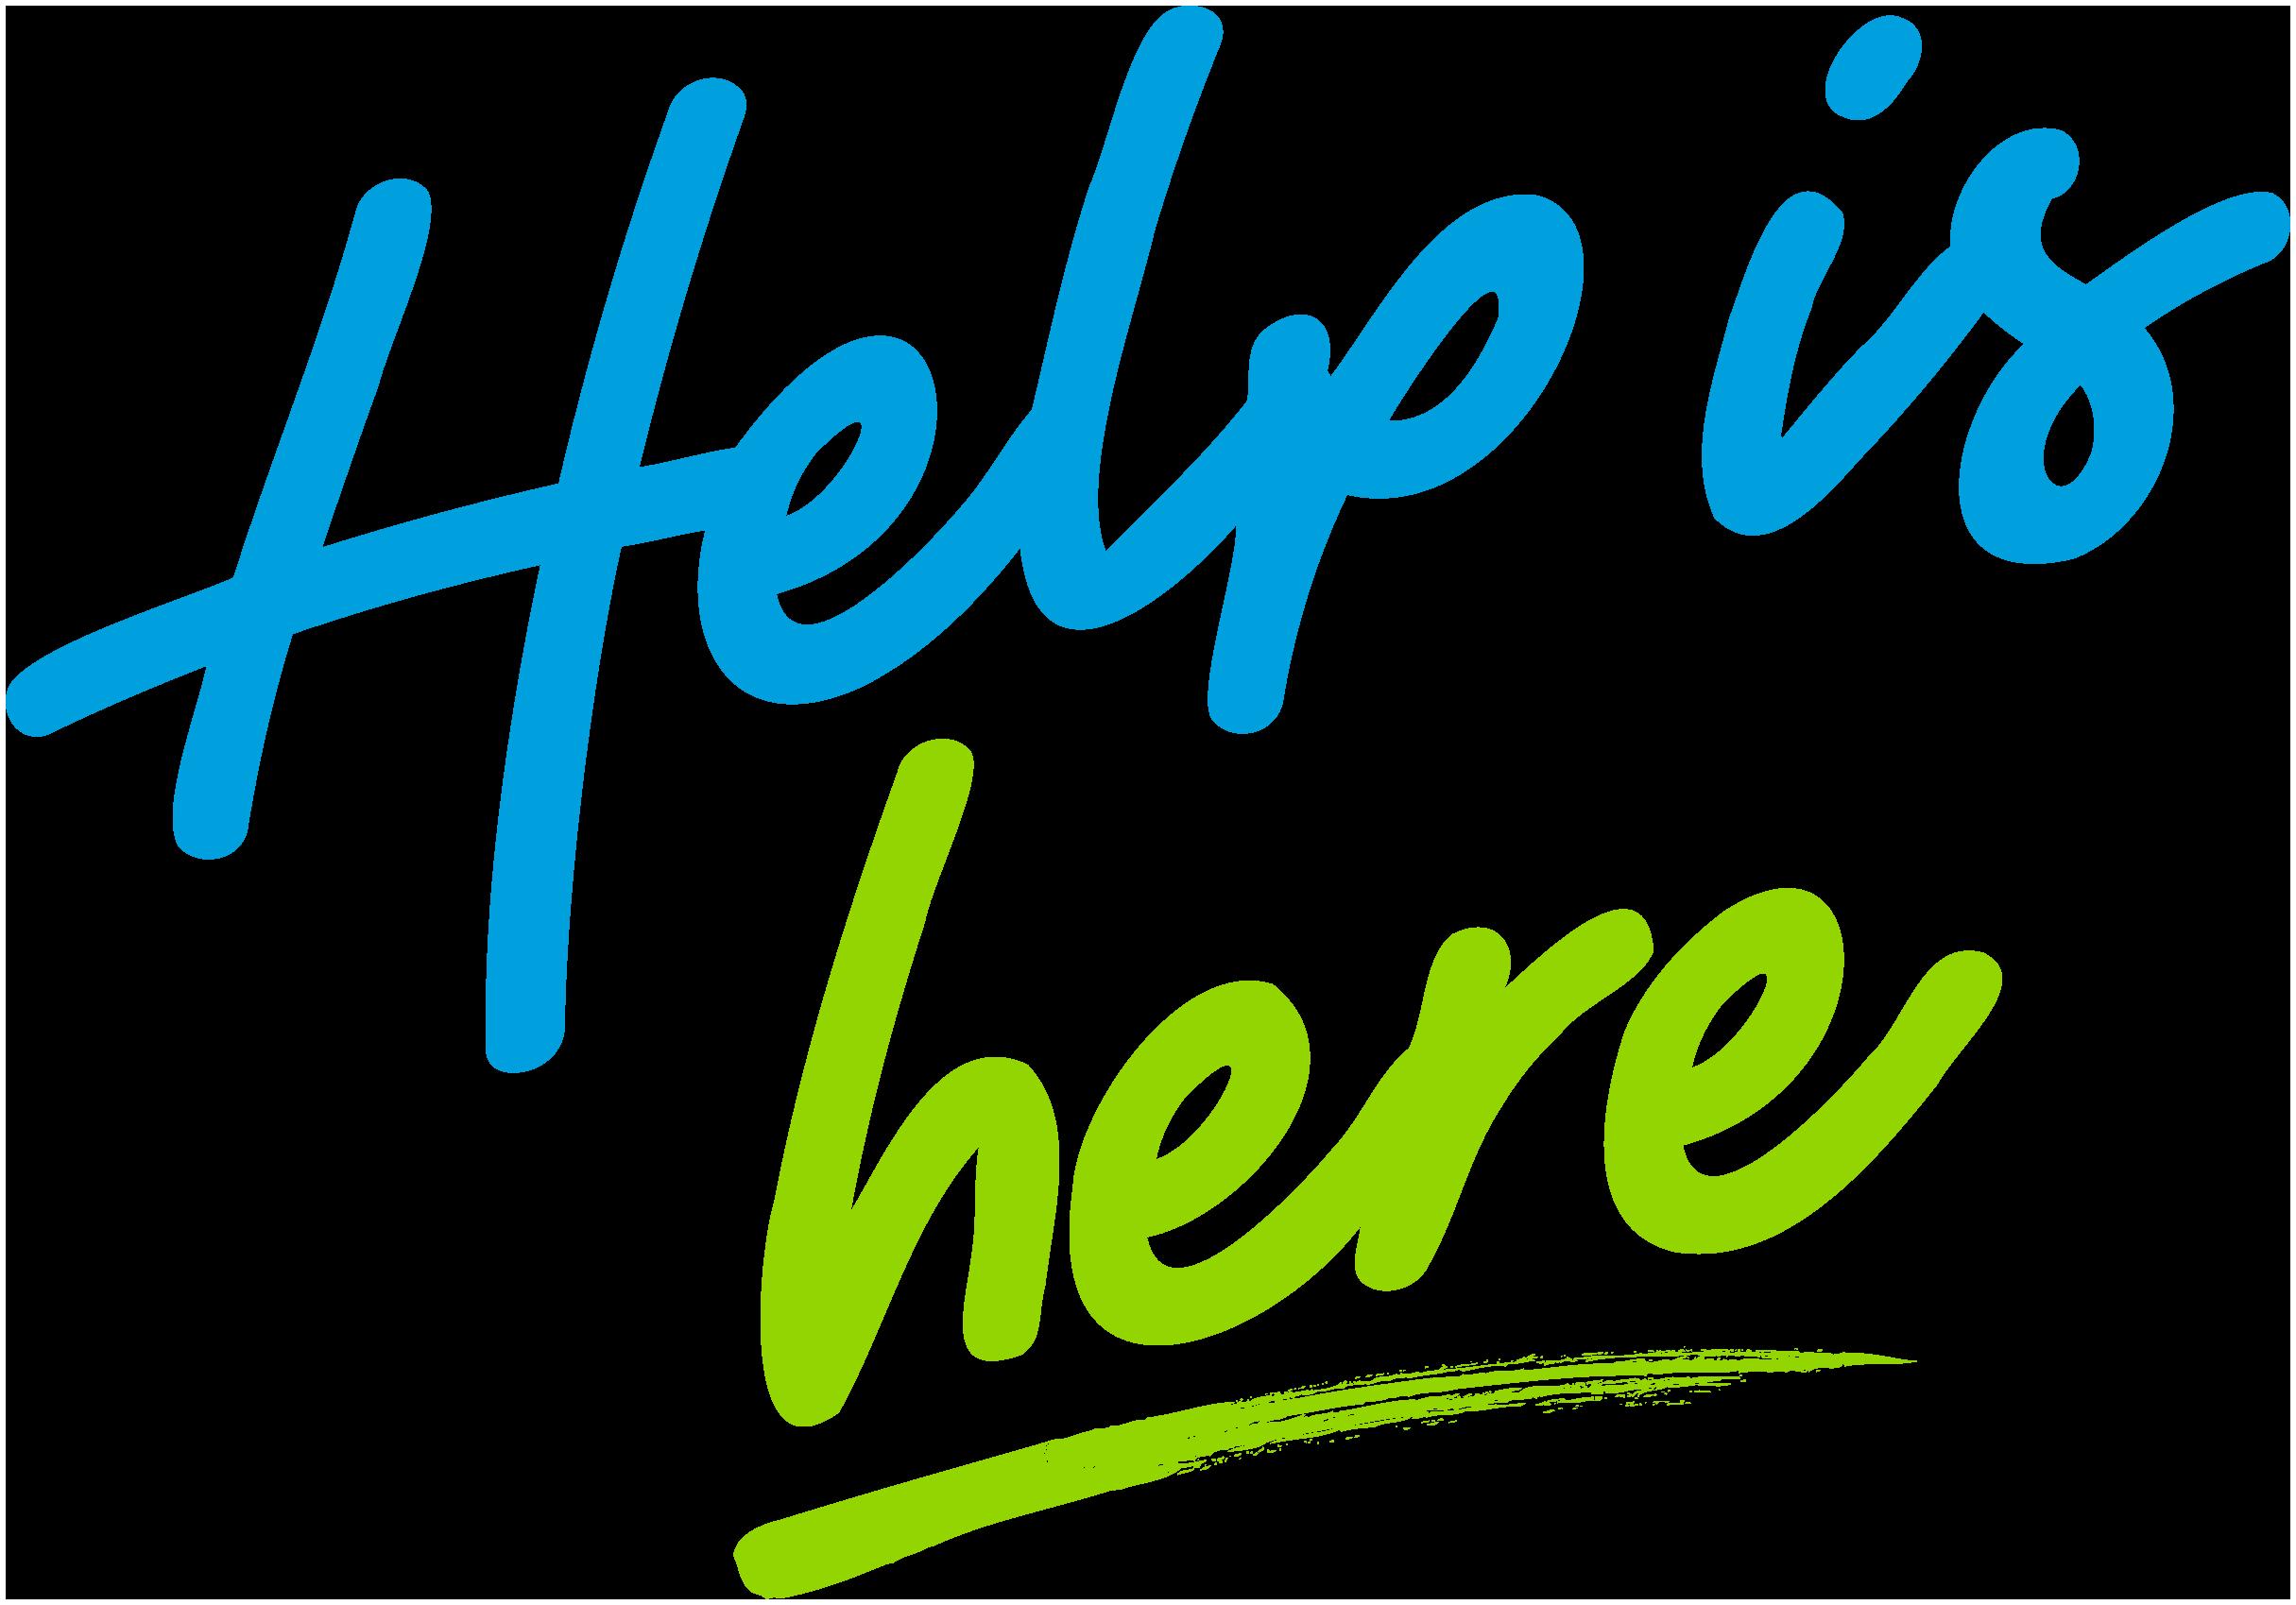 Help is Here logo